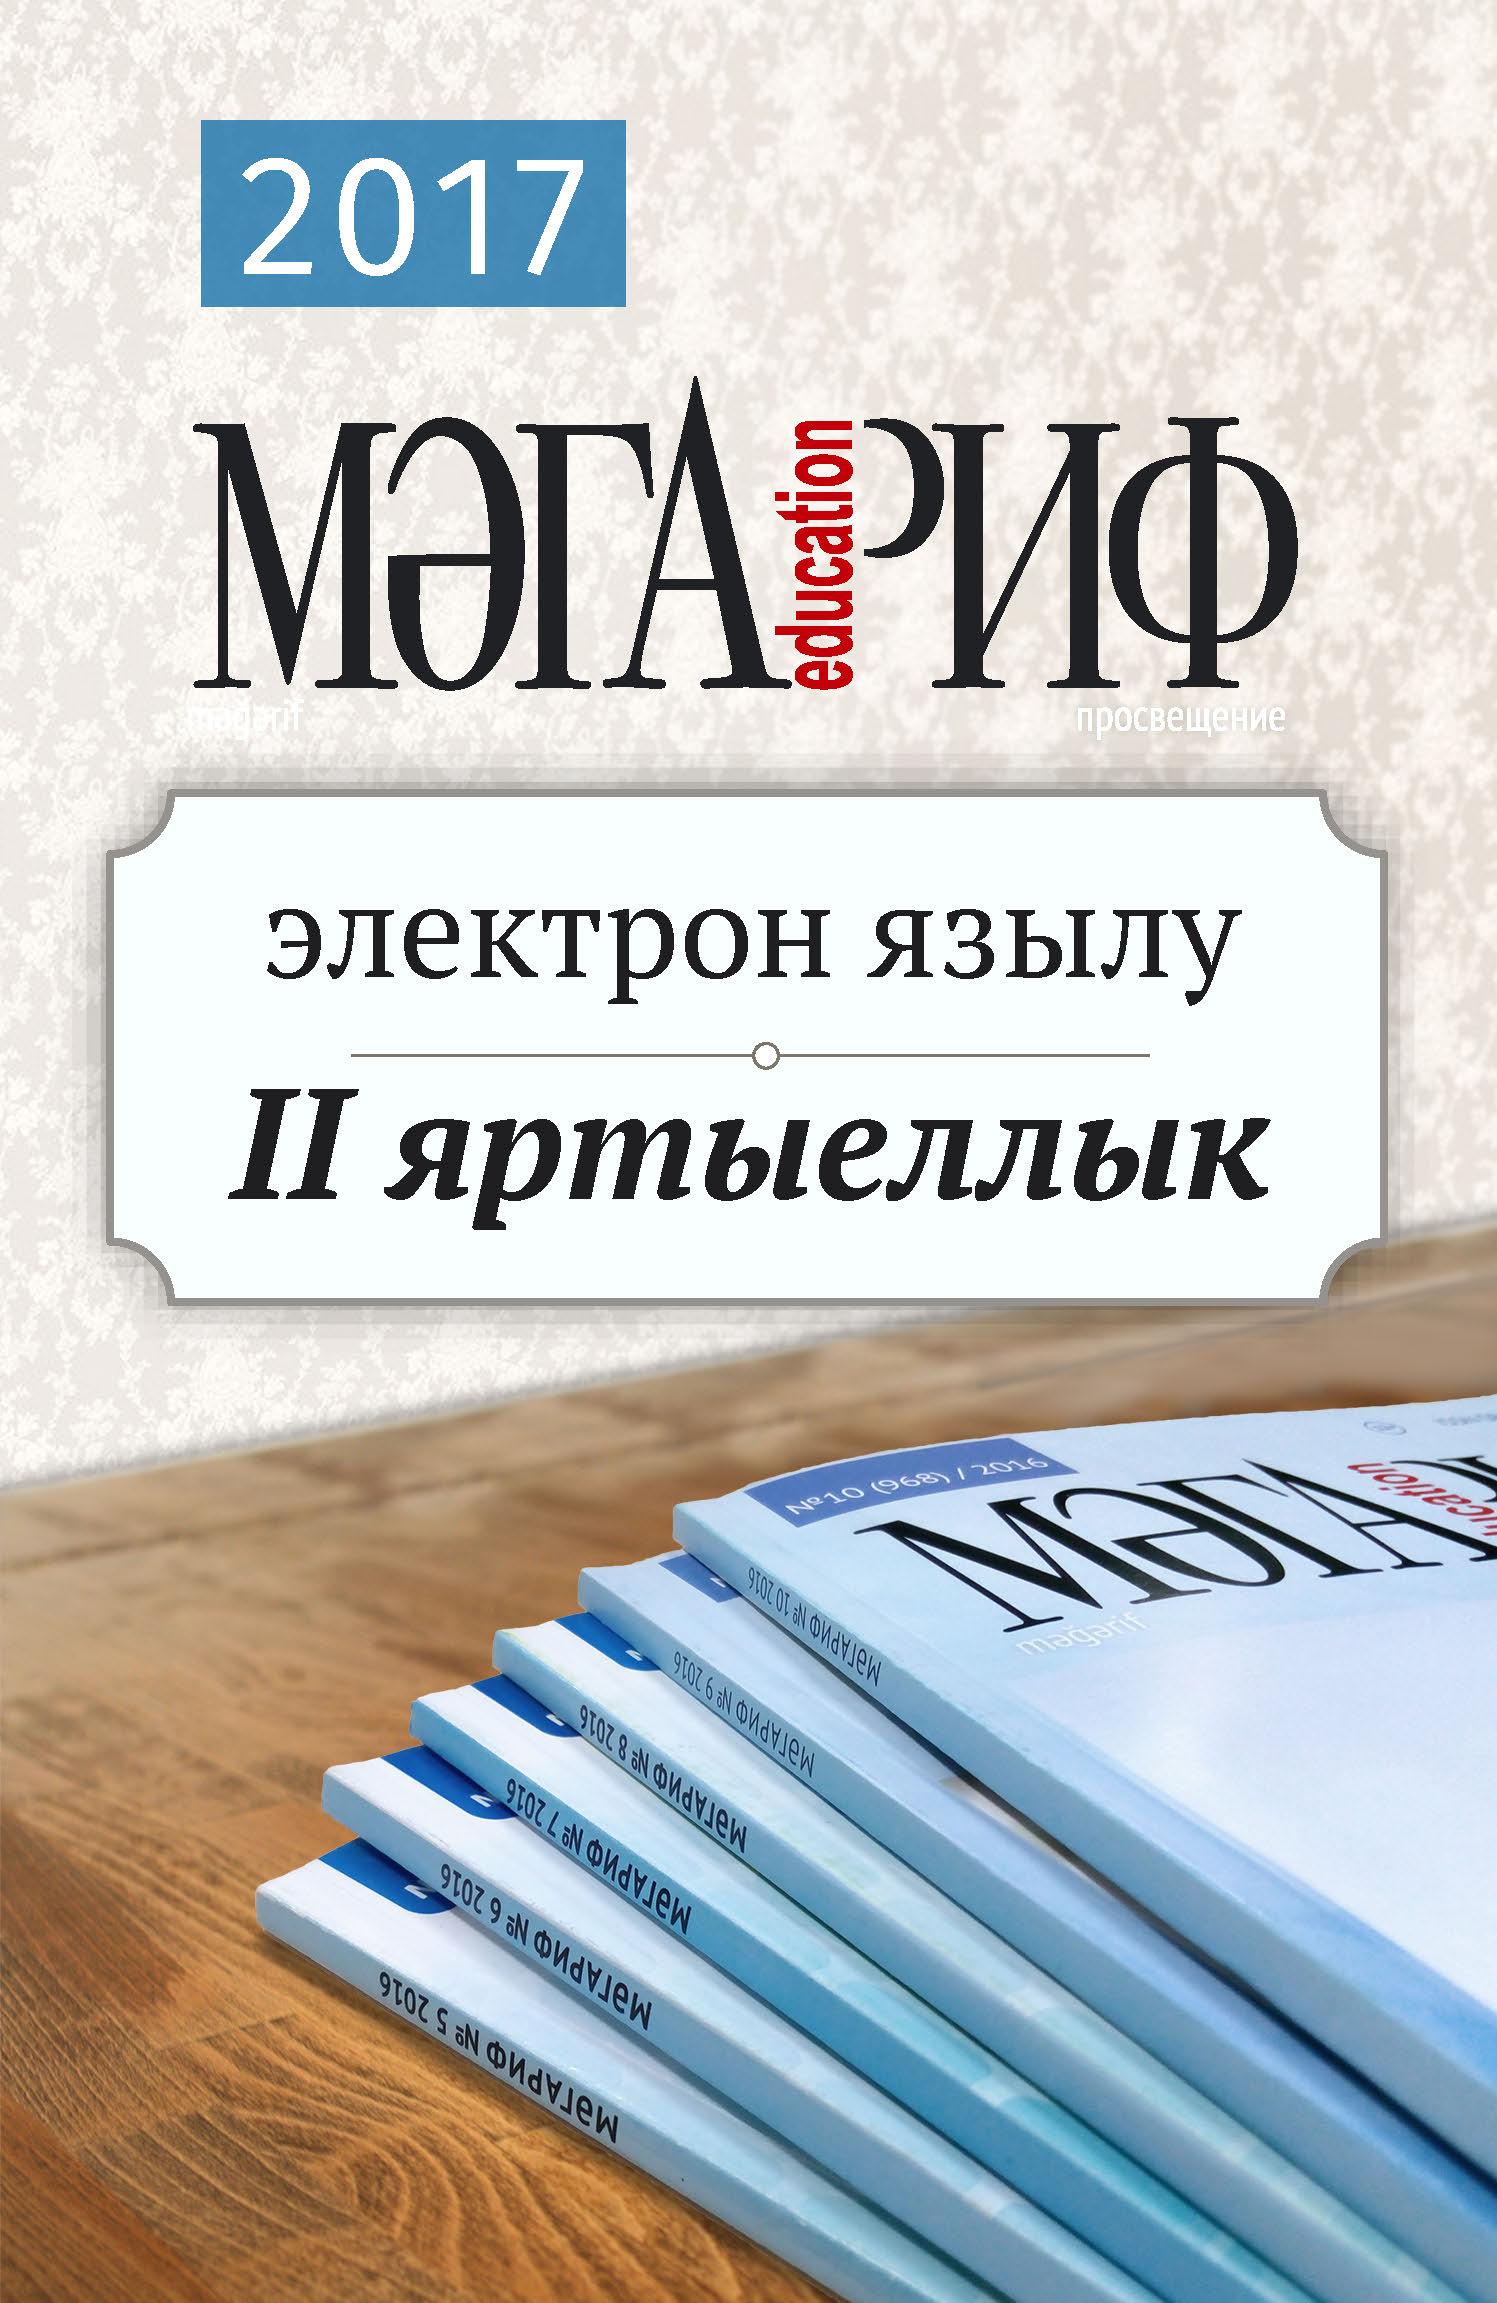 Баннер эл. подписка_Страница_1